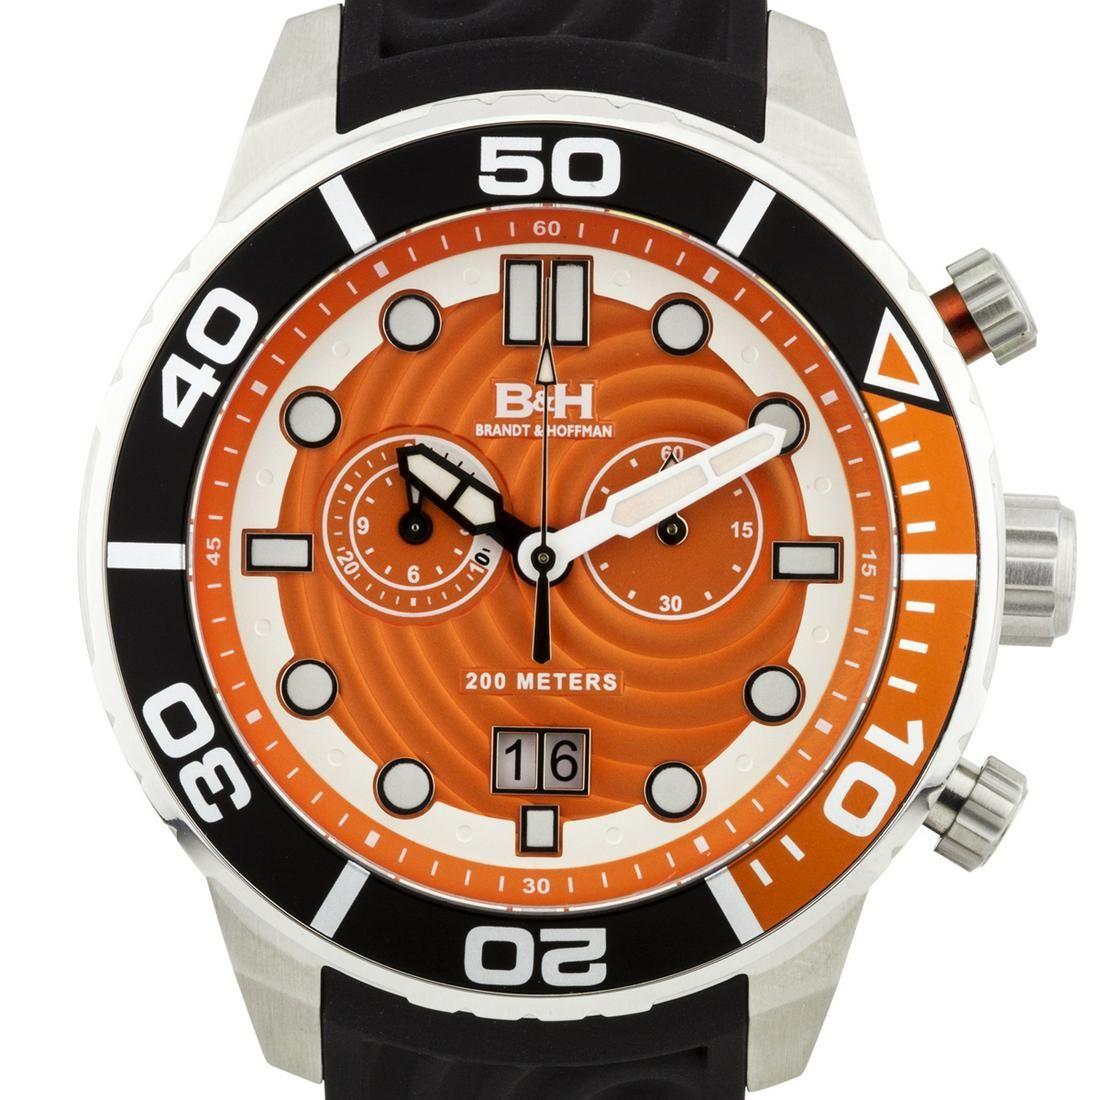 Brandt & Hoffman Men's Swiss Chronograph Watch